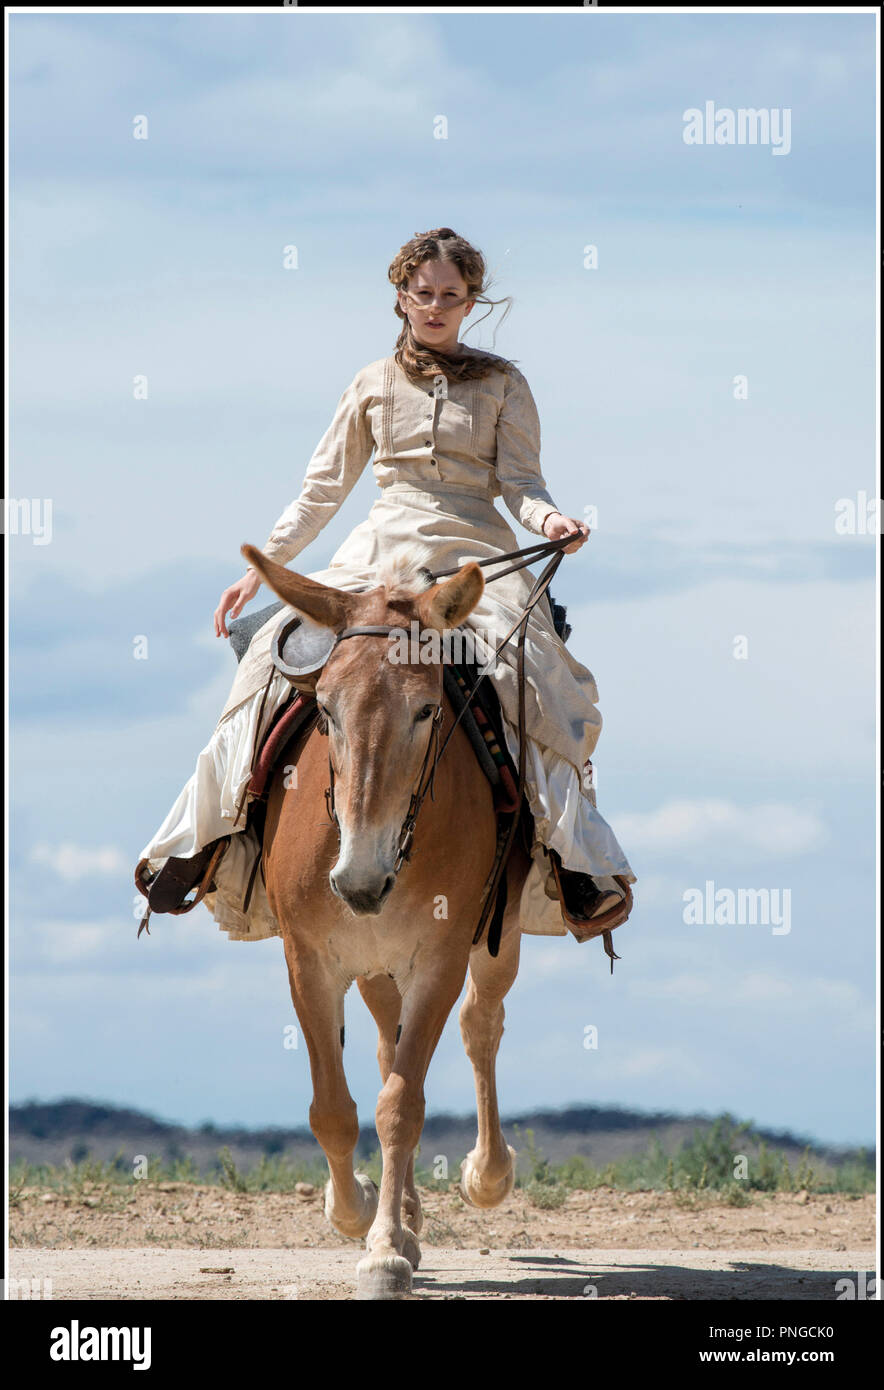 Prod DB © Universal - Blumhouse Productions / DR IN A VALLEY OF VIOLENCE de Ti West 2016 USA avec Taissa Farmiga western - Stock Image